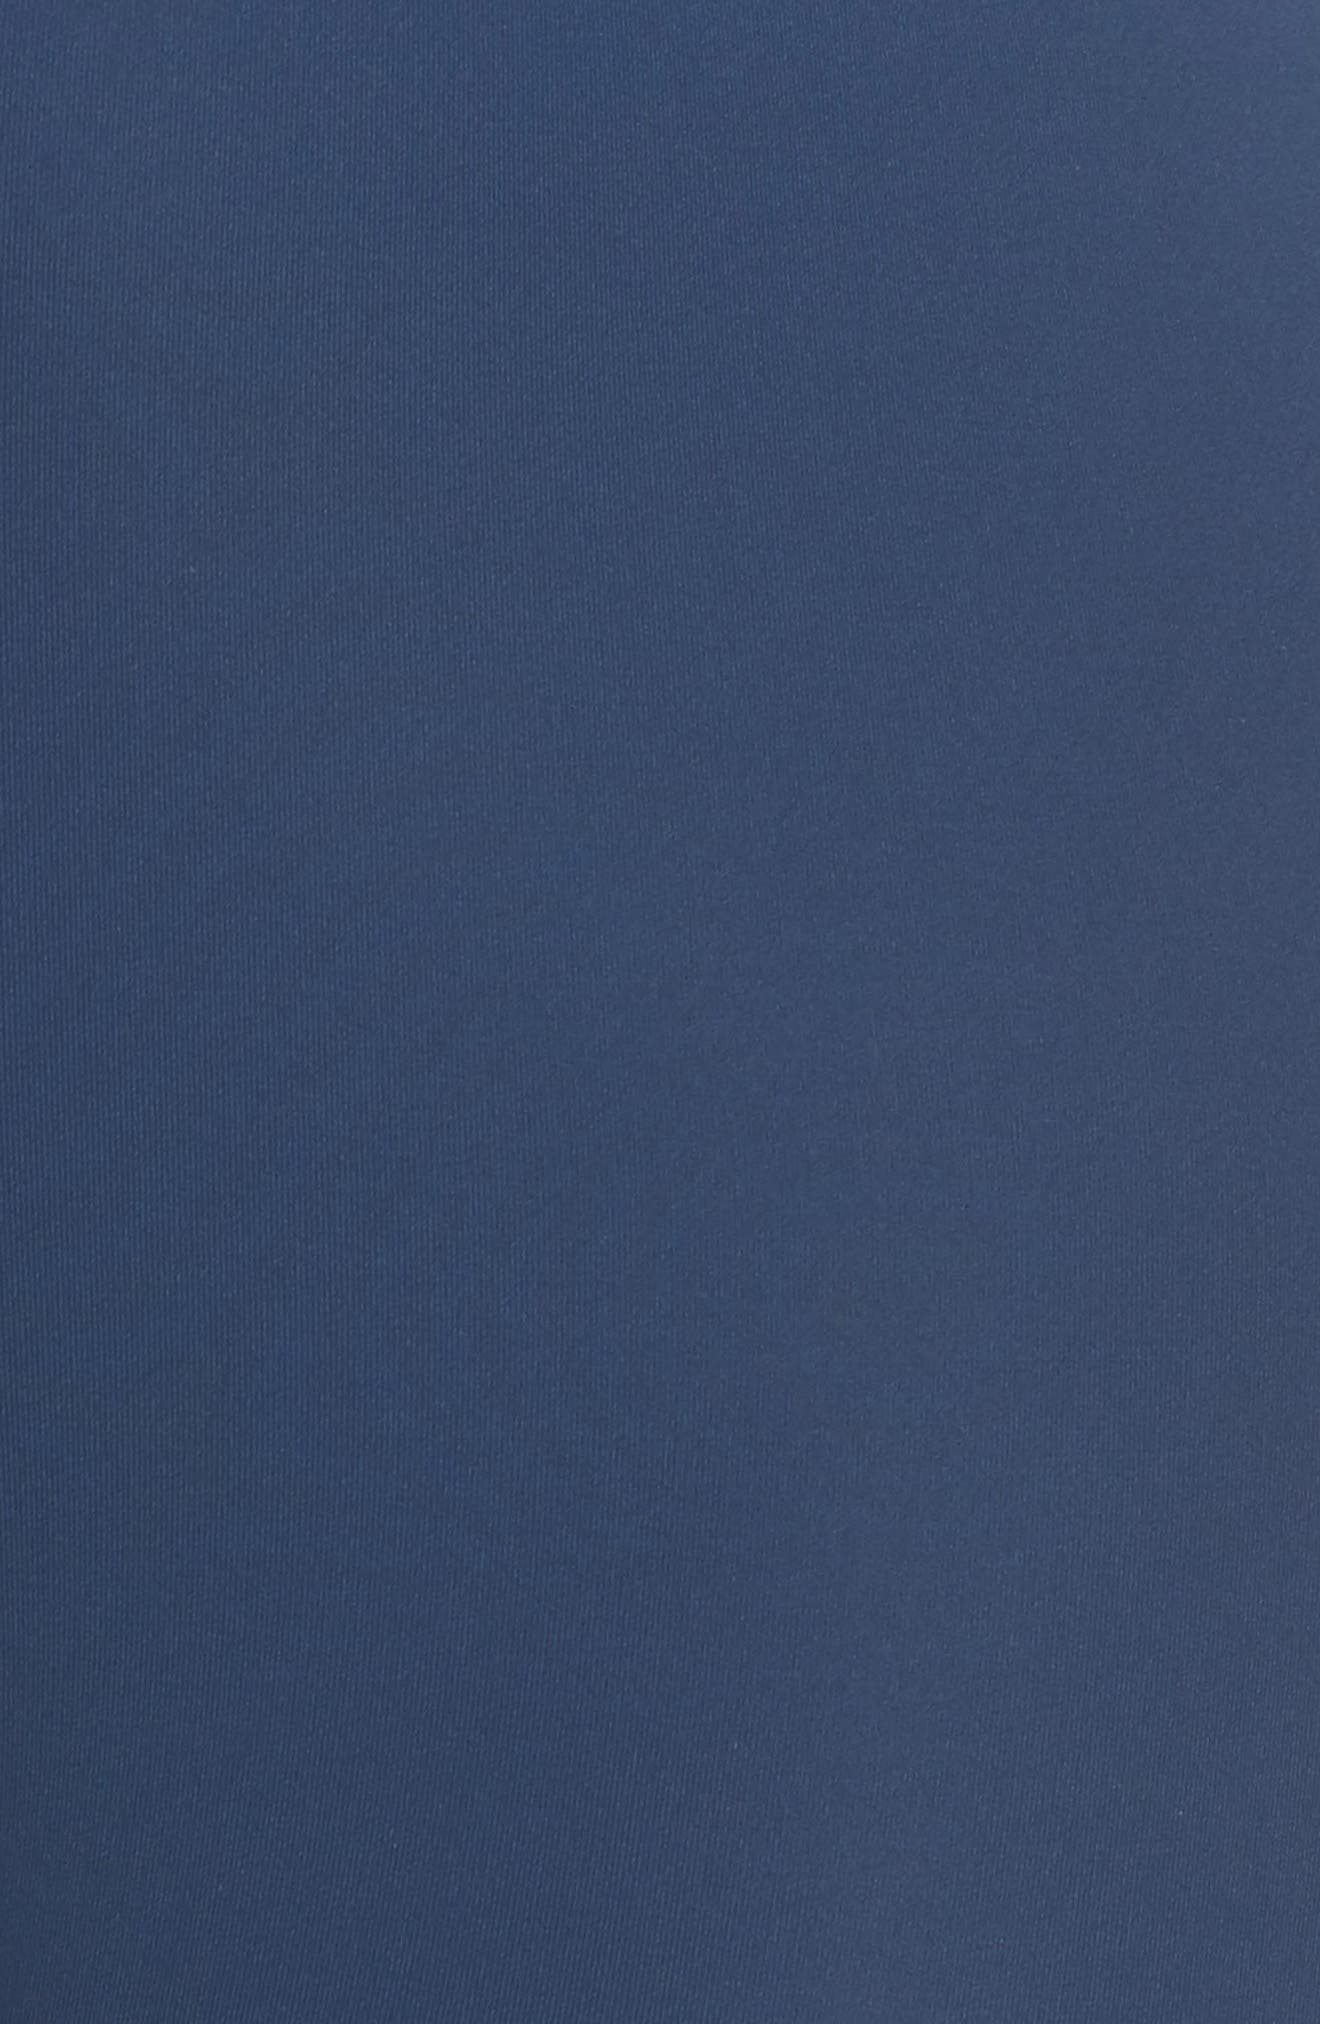 Great Heights Vision High Waist Midi Leggings,                             Alternate thumbnail 4, color,                             Blue Insignia